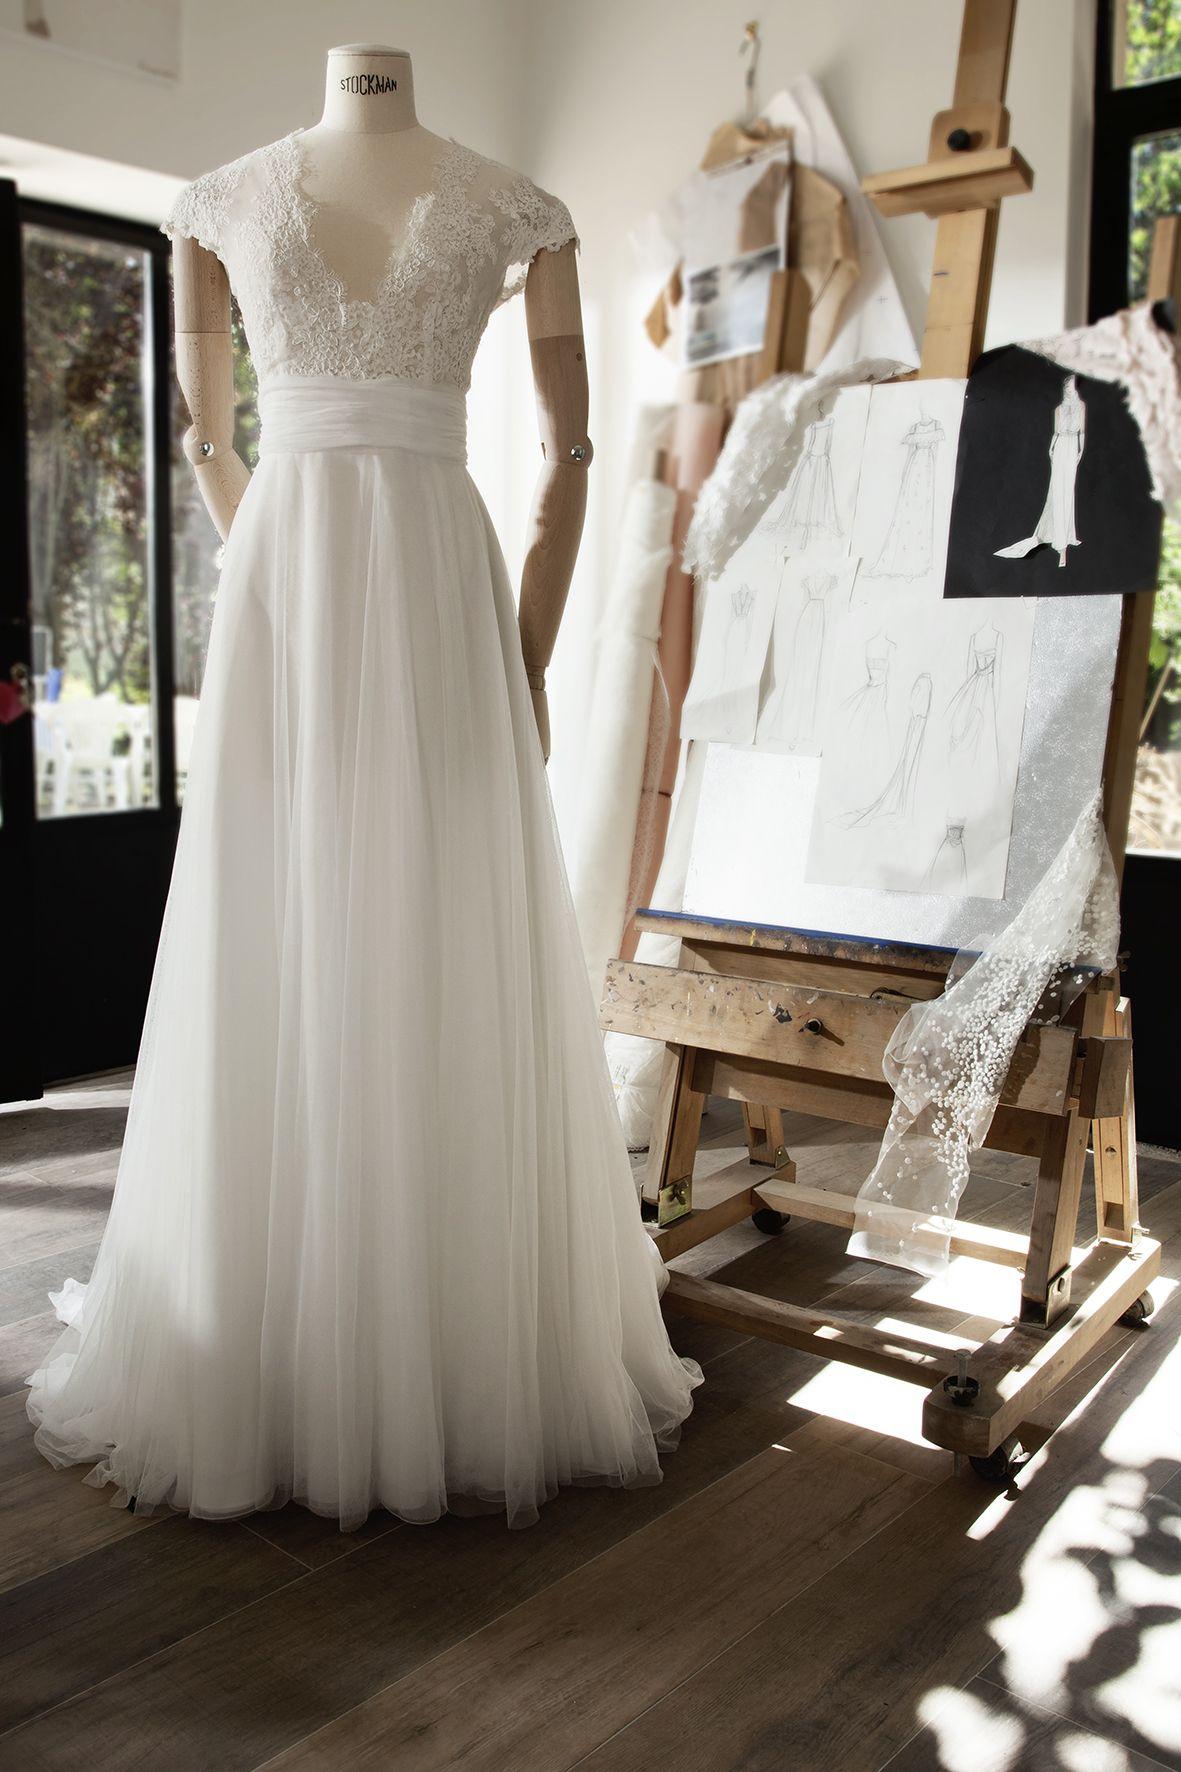 Robe Angel Wedding Dresses Dream Wedding Dresses Bridal Gowns